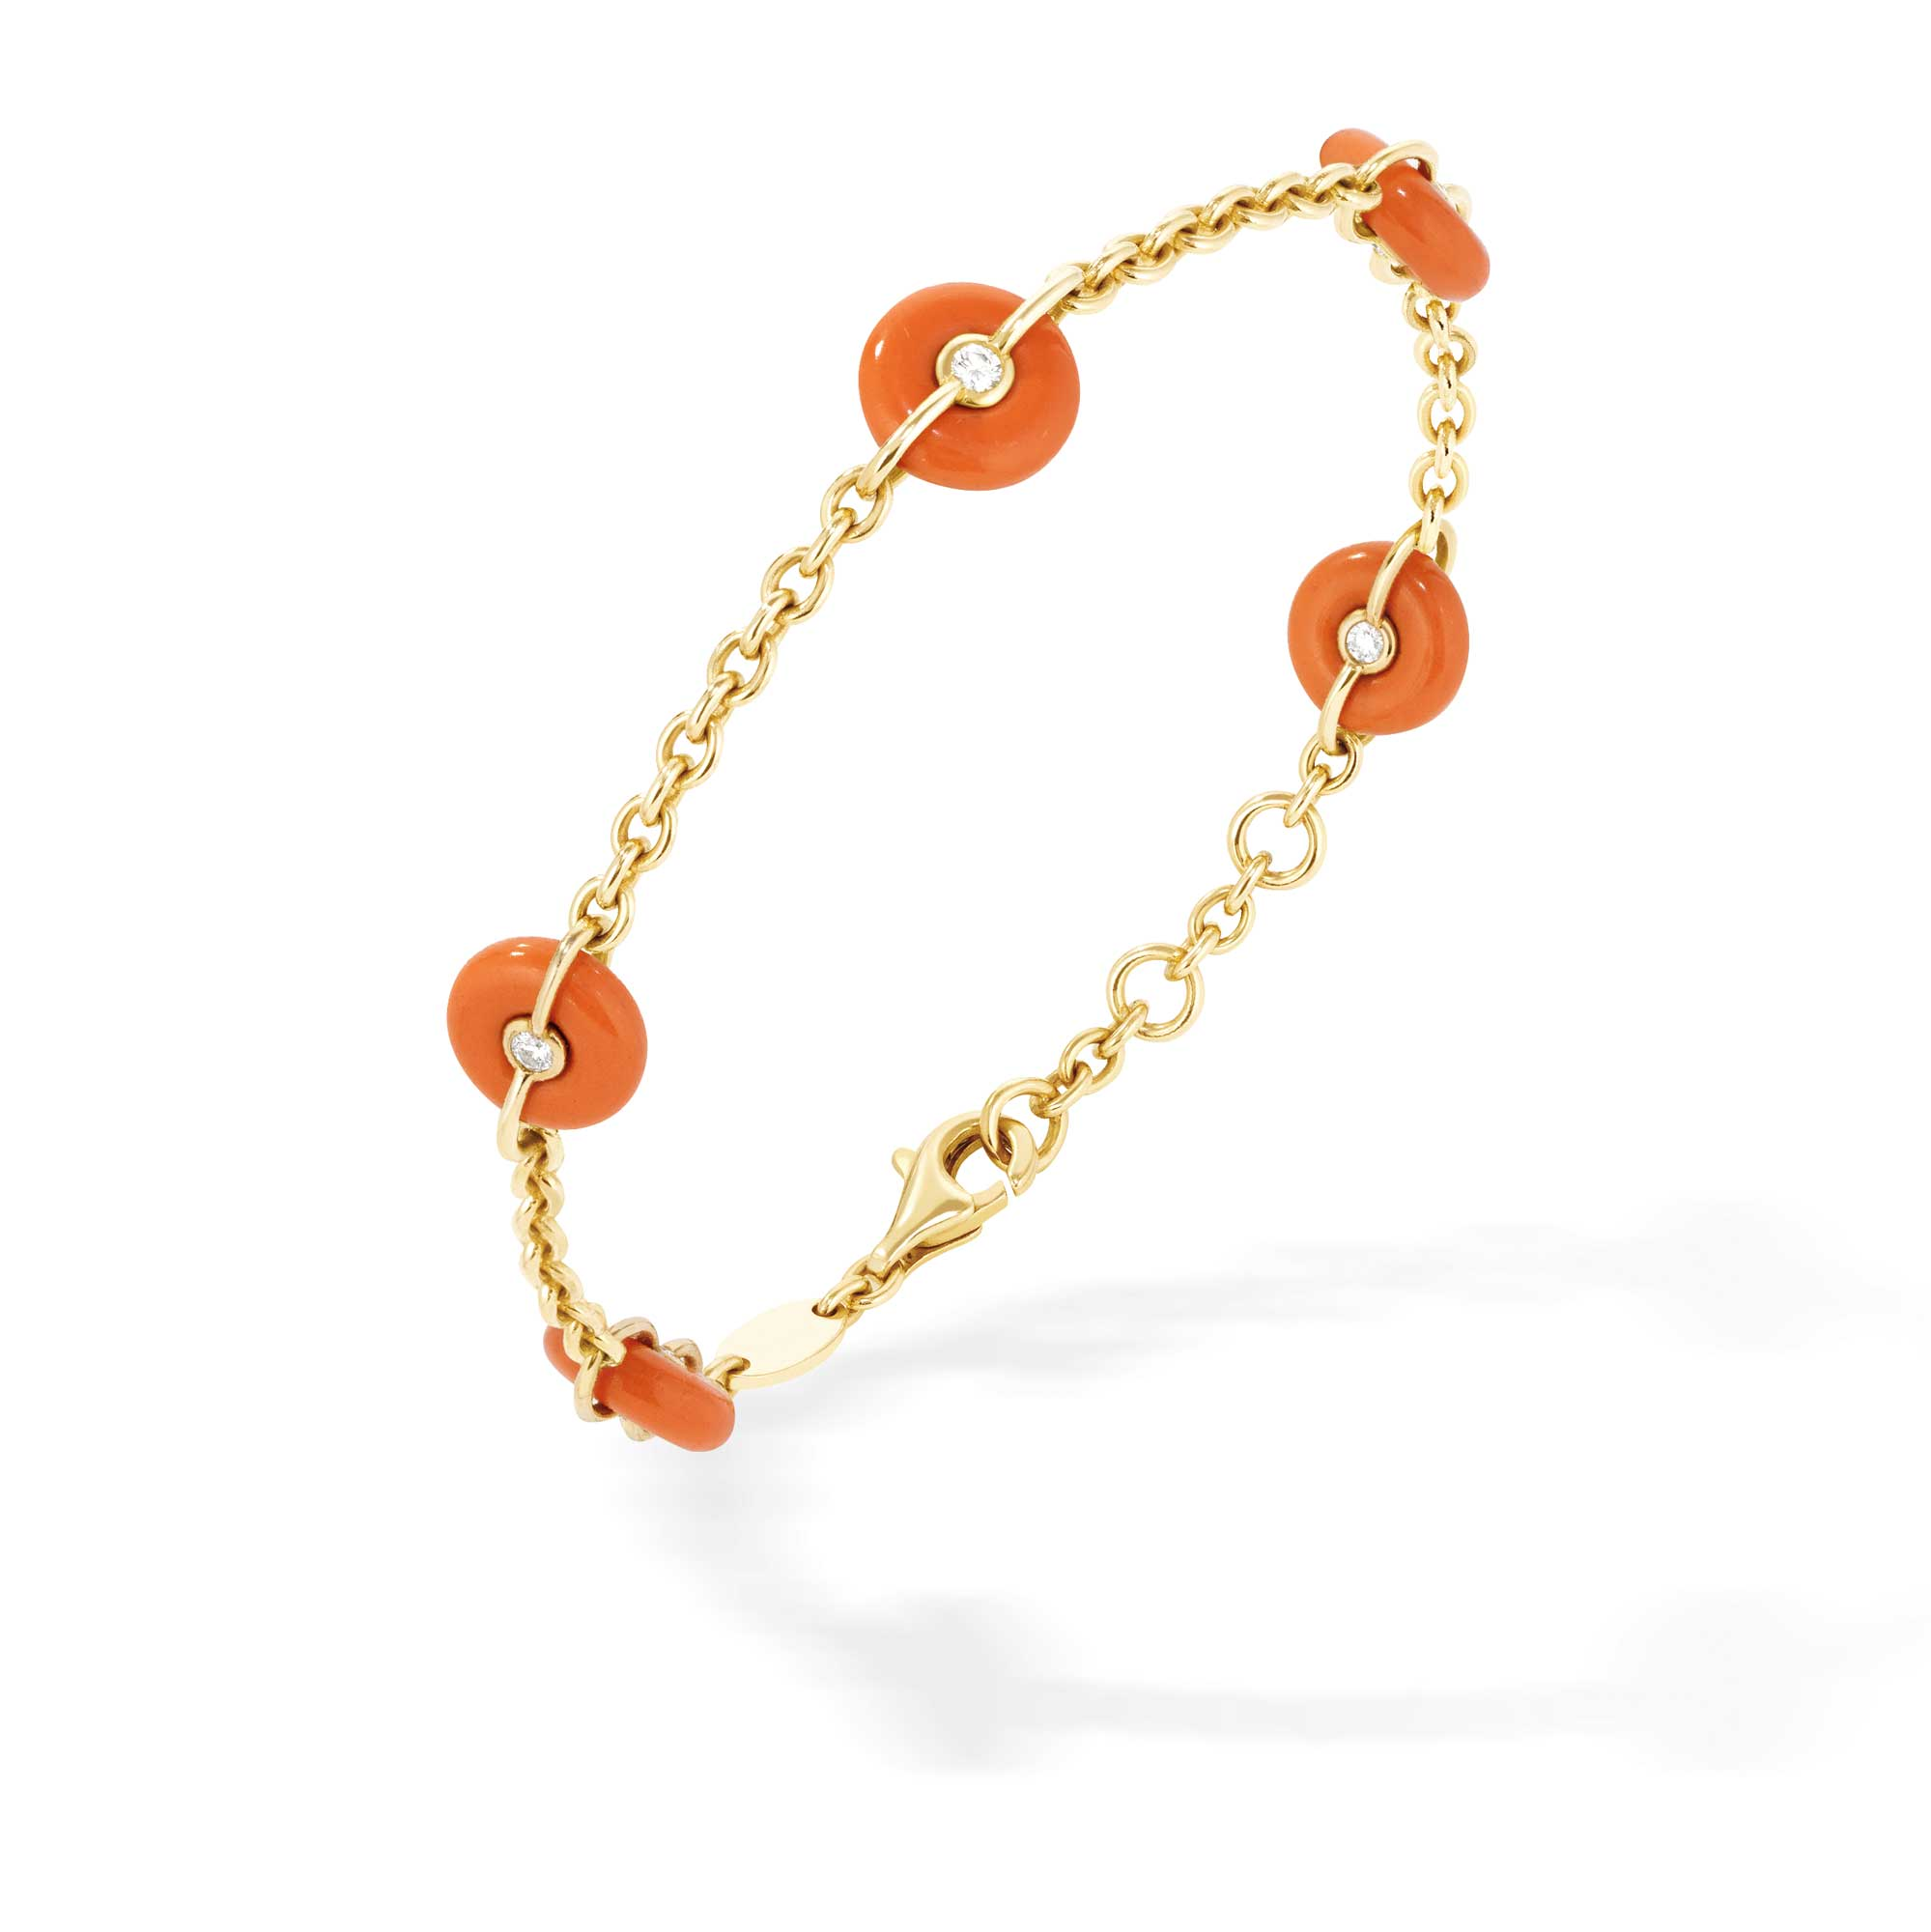 Yellow Gold Chain Bracelet & coral 5 buoys - Canaglia Paris-Milan Fine Jewelry